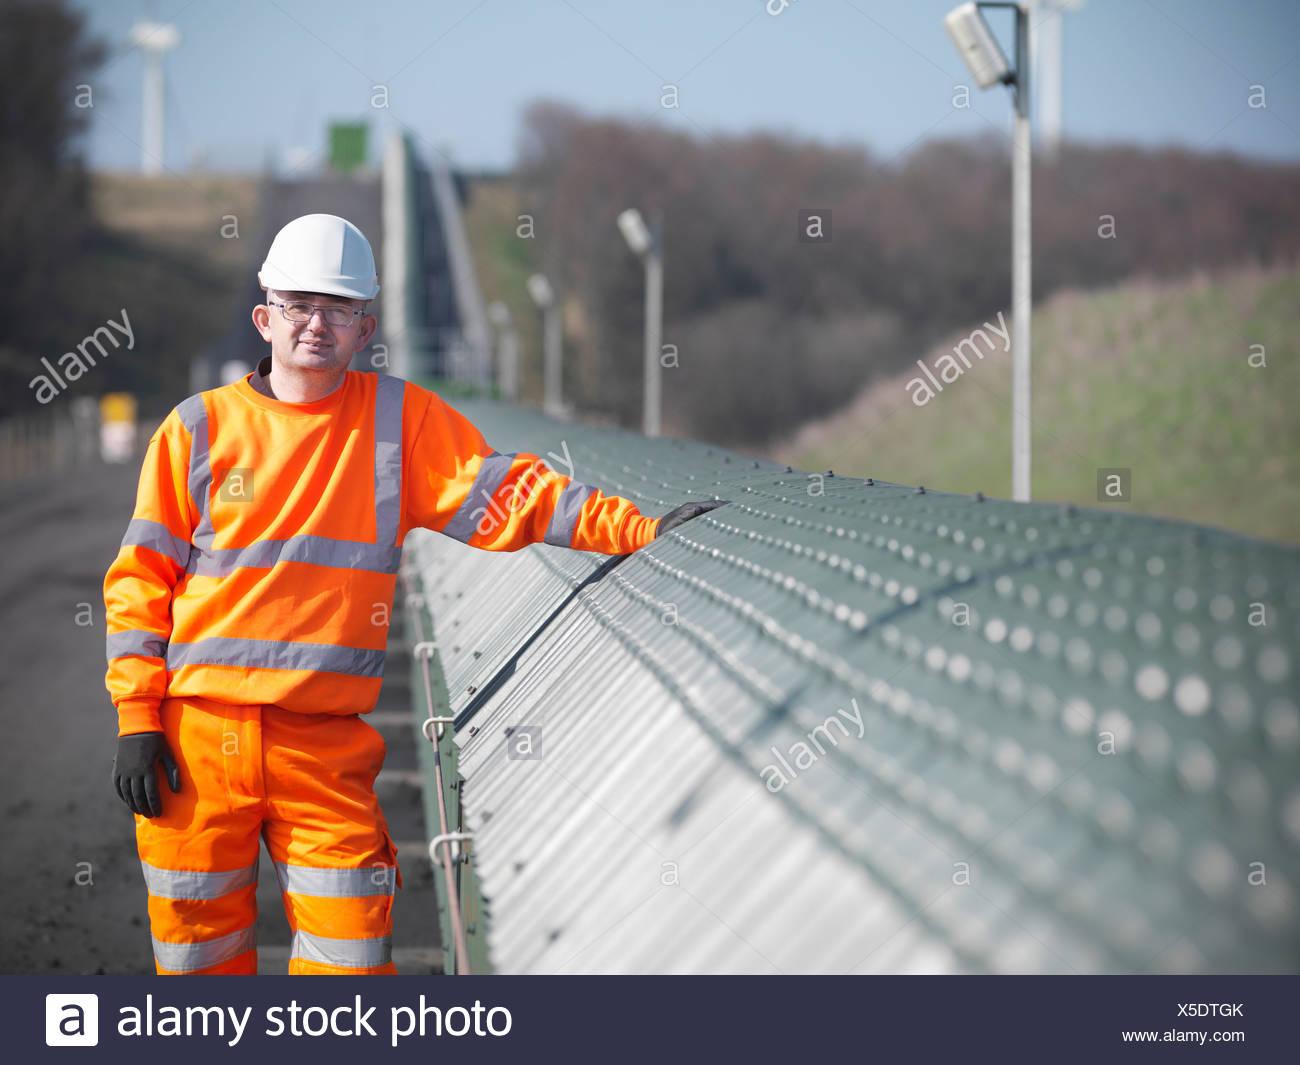 Arbeiter von Förderband im Kohlebergwerk Stockbild